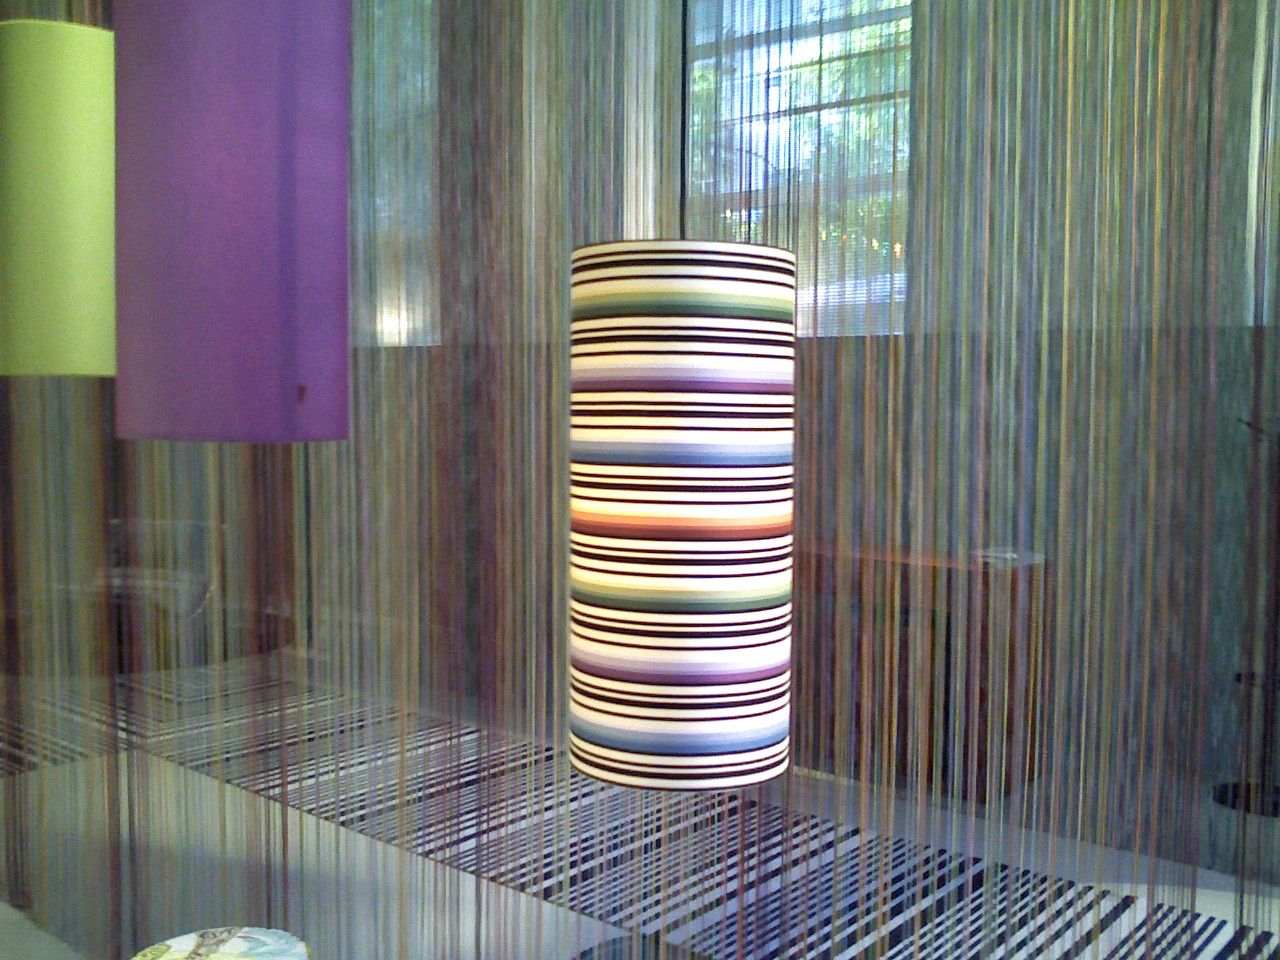 Cappelli Lampade Roma: Cappelli per lampade da terra paralumi en cera legno vetro.